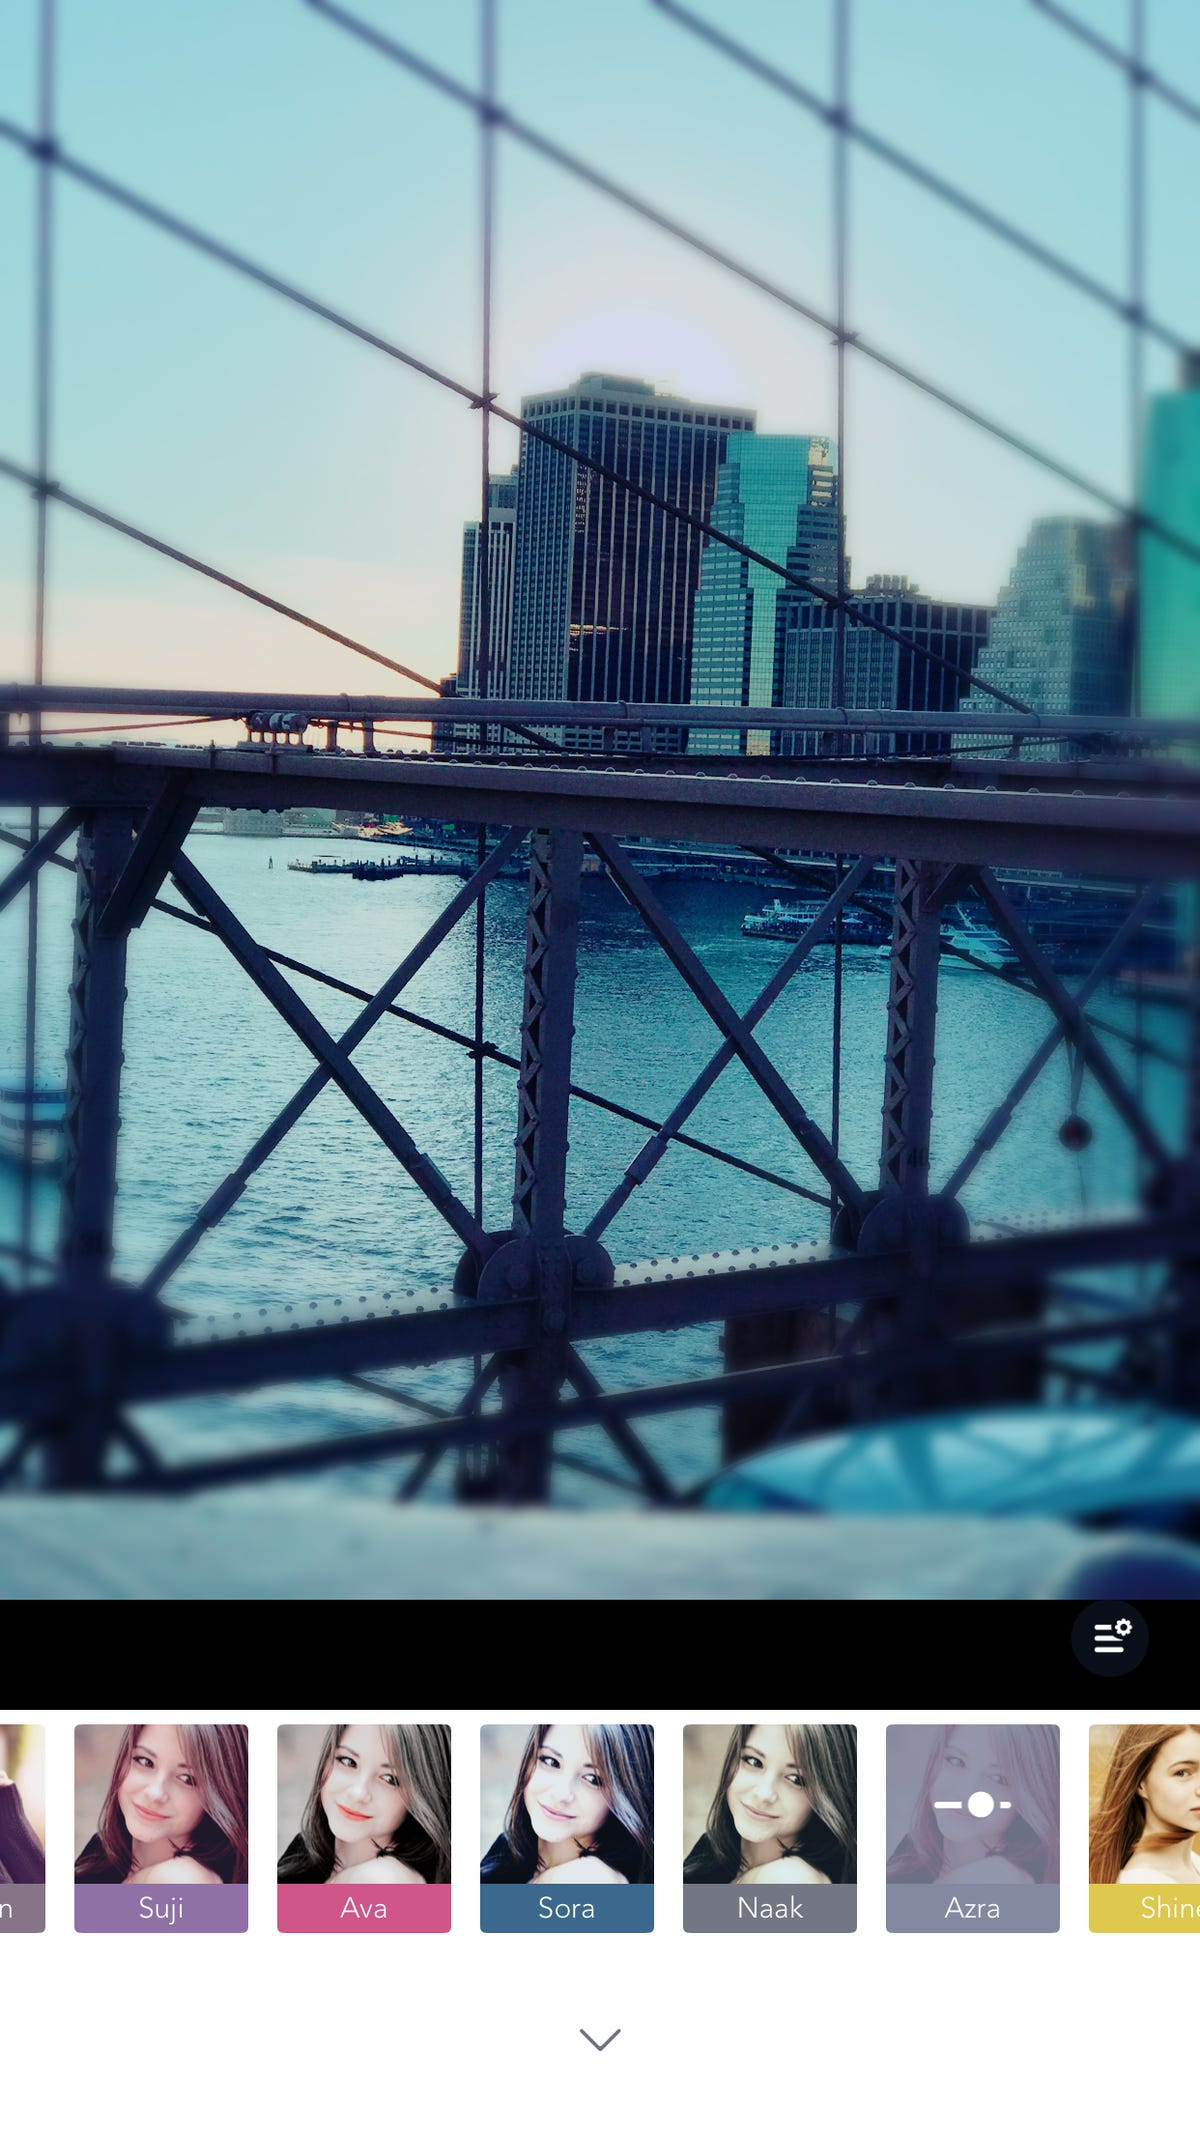 Best Filter Apps For Instagram - Extra Filters Apps